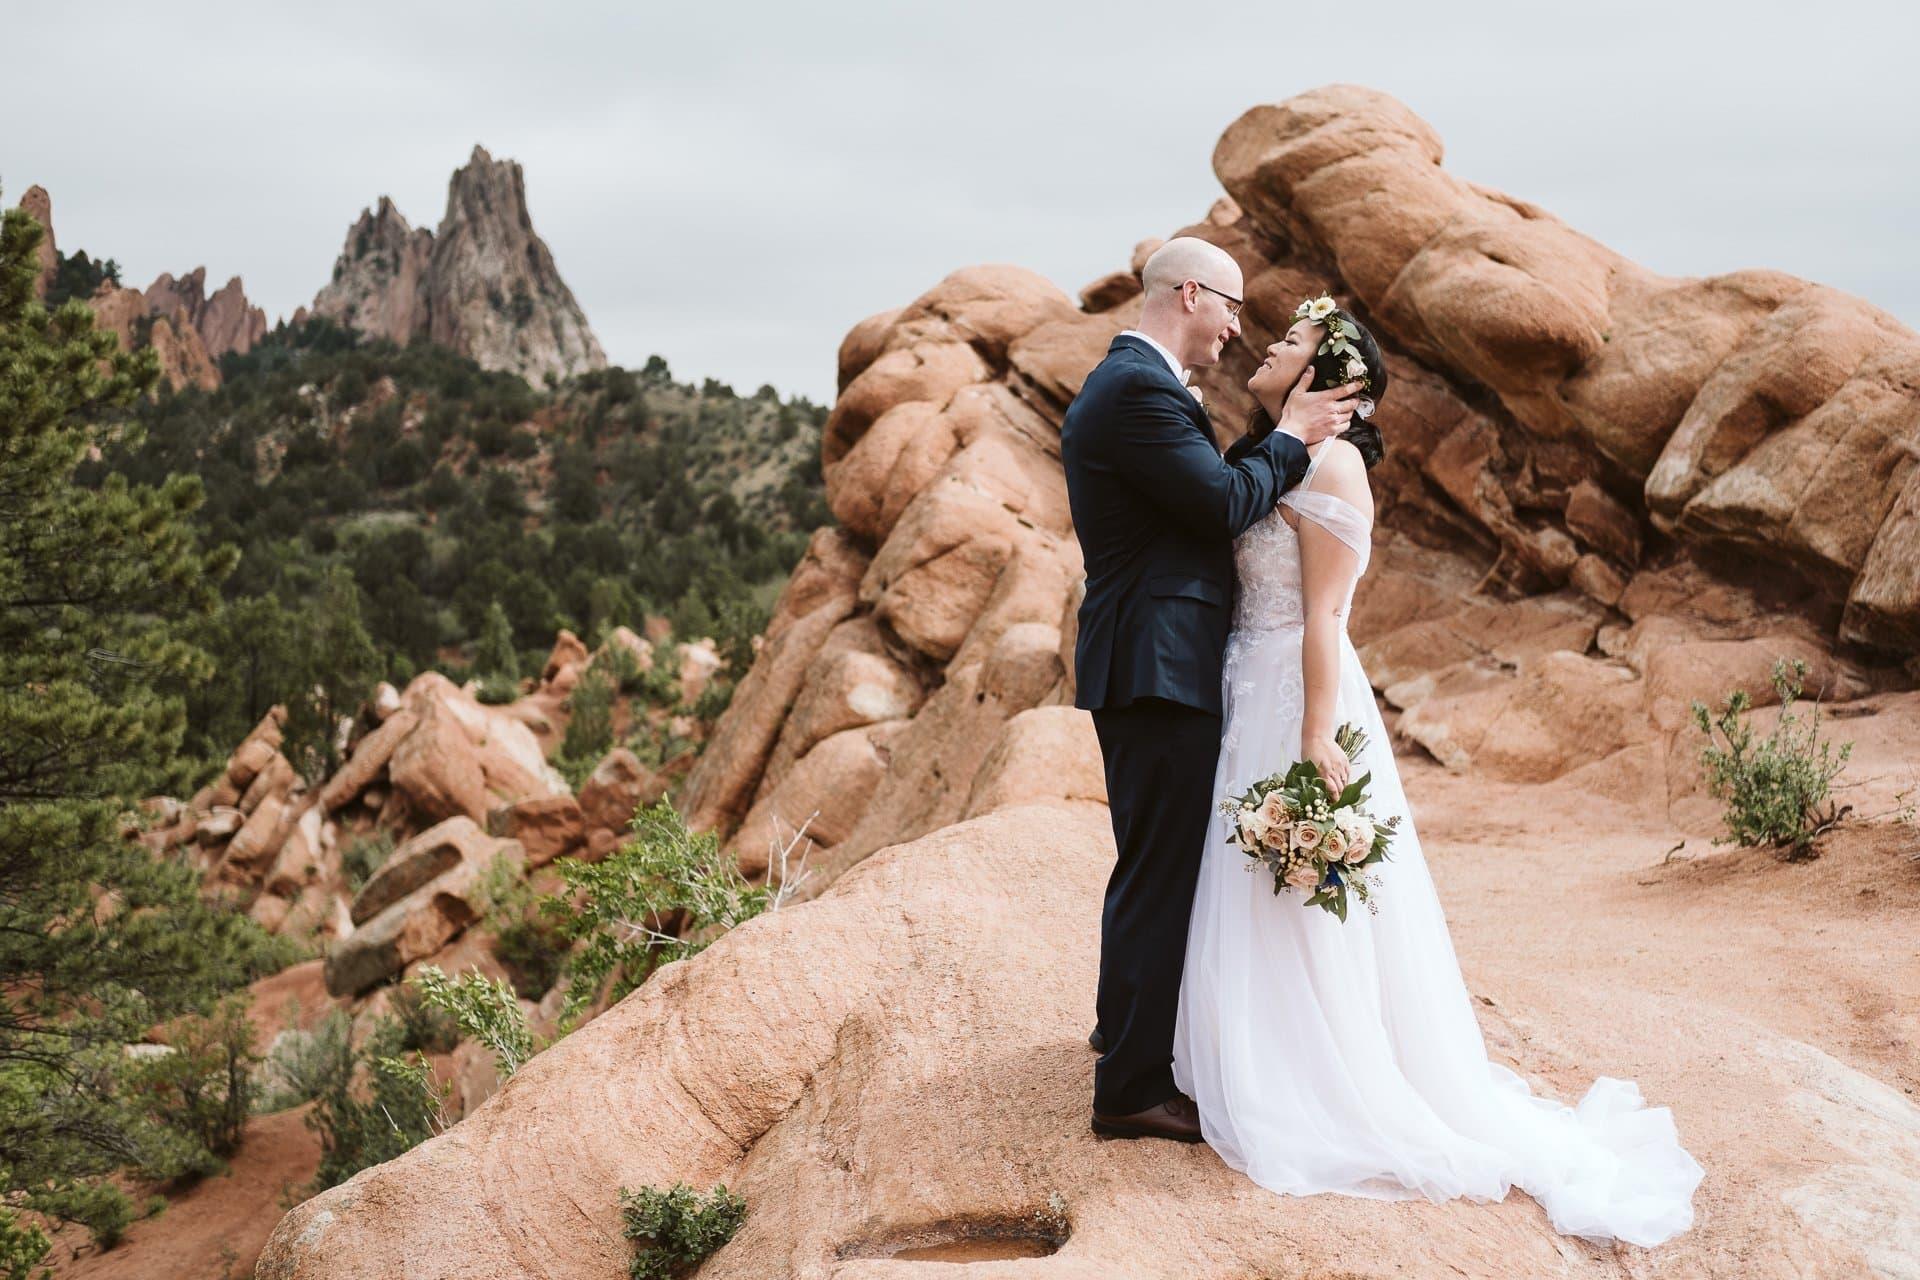 Garden of the Gods elopement in Colorado Springs, Colorado elopement photographer